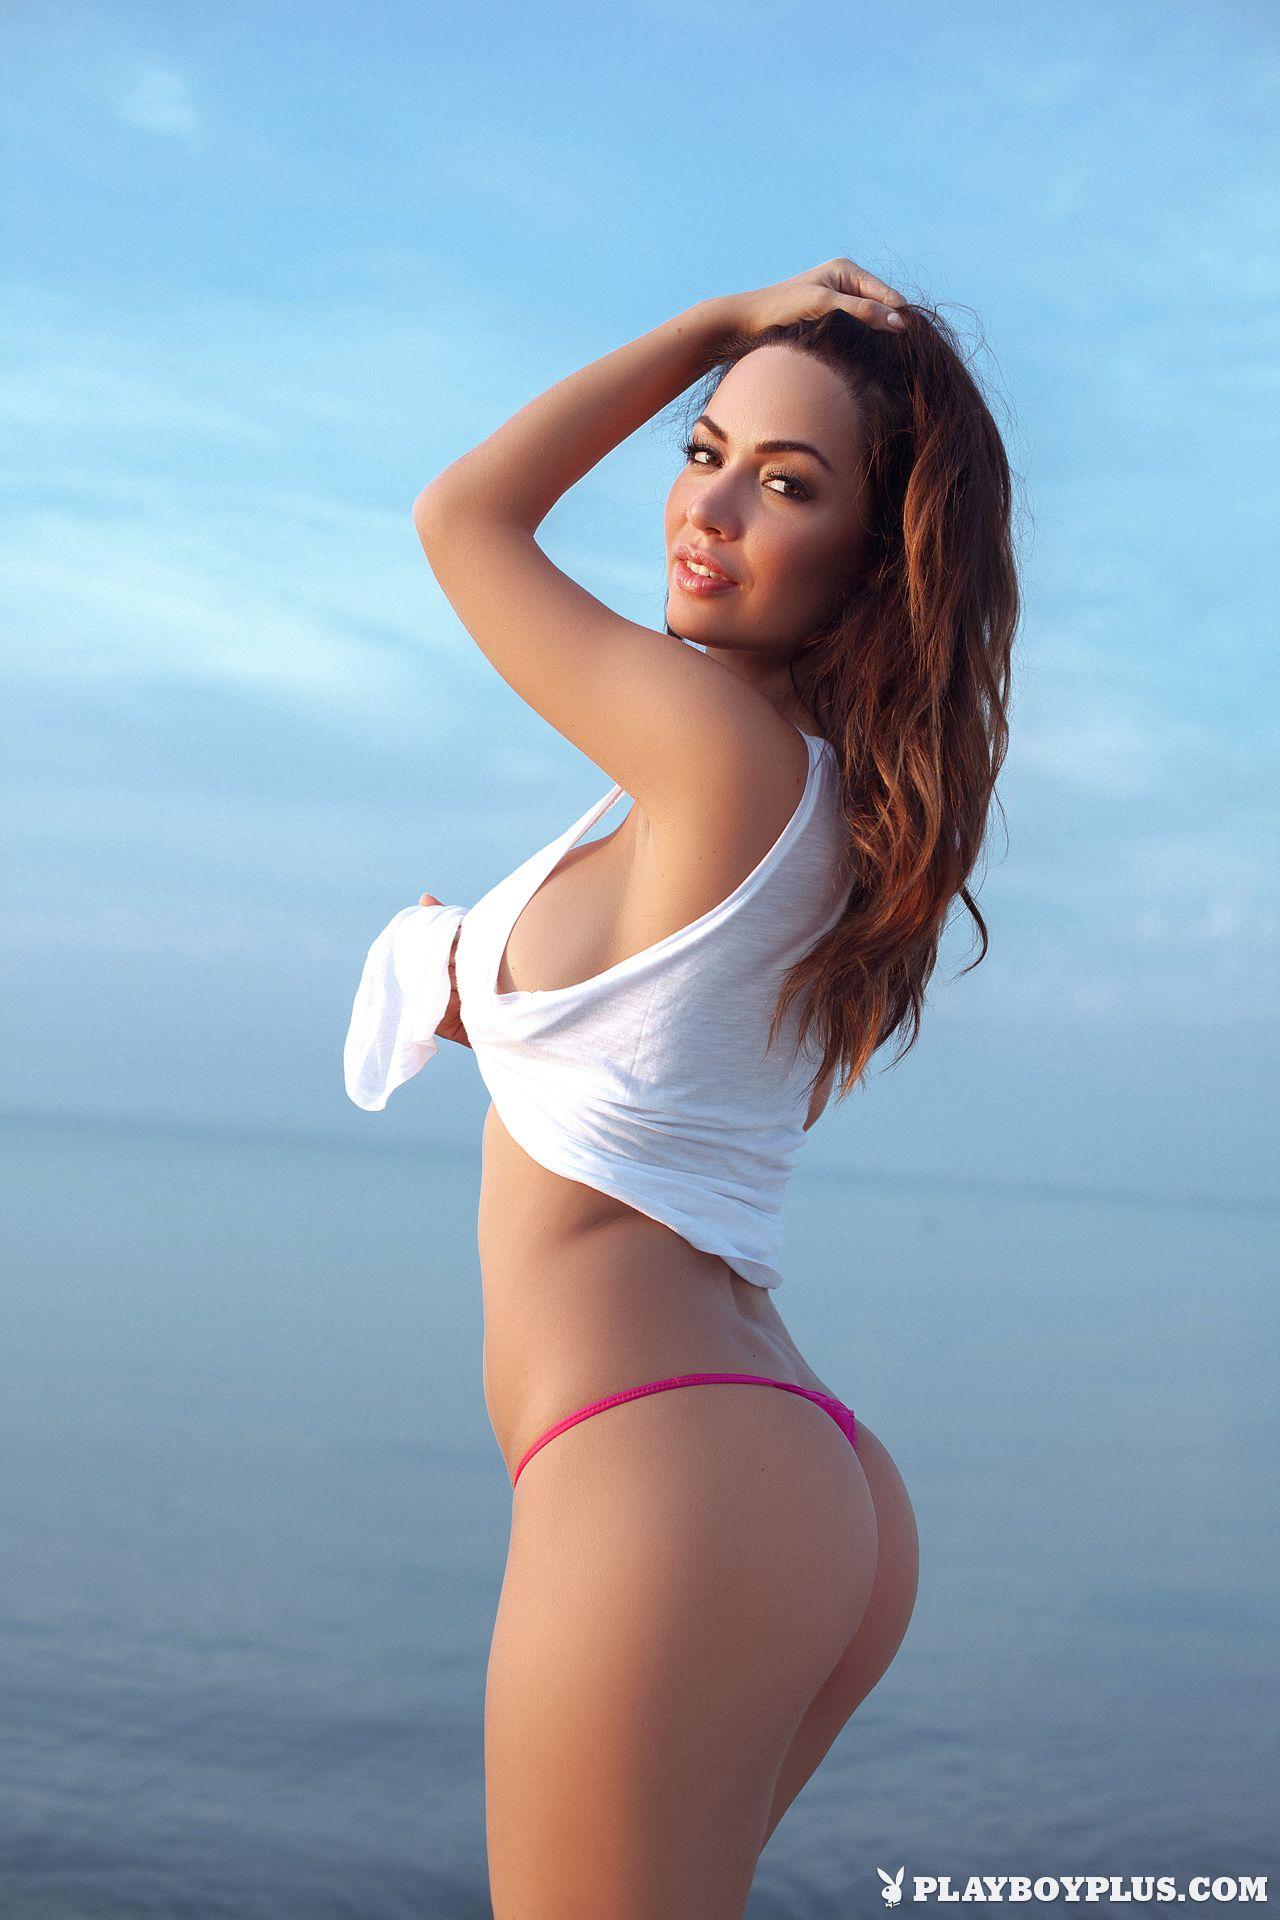 Hacked Roos van Montfort nudes (65 photos), Tits, Paparazzi, Twitter, braless 2020